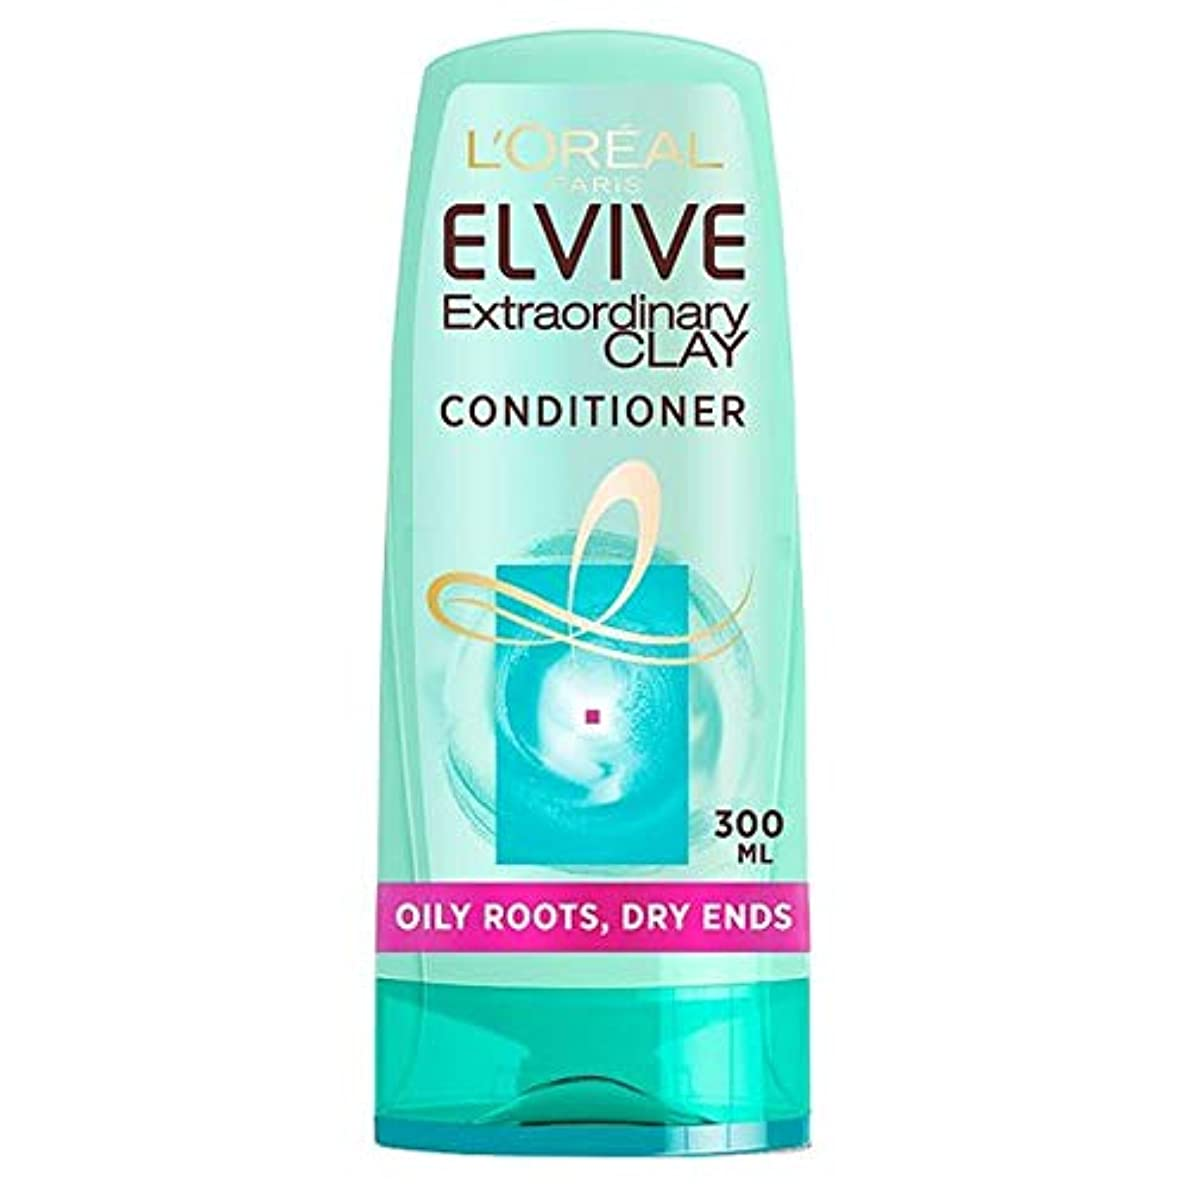 [Elvive] ロレアルのElvive粘土油性根コンディショナー300ミリリットル - L'oreal Elvive Clay Oily Roots Conditioner 300Ml [並行輸入品]